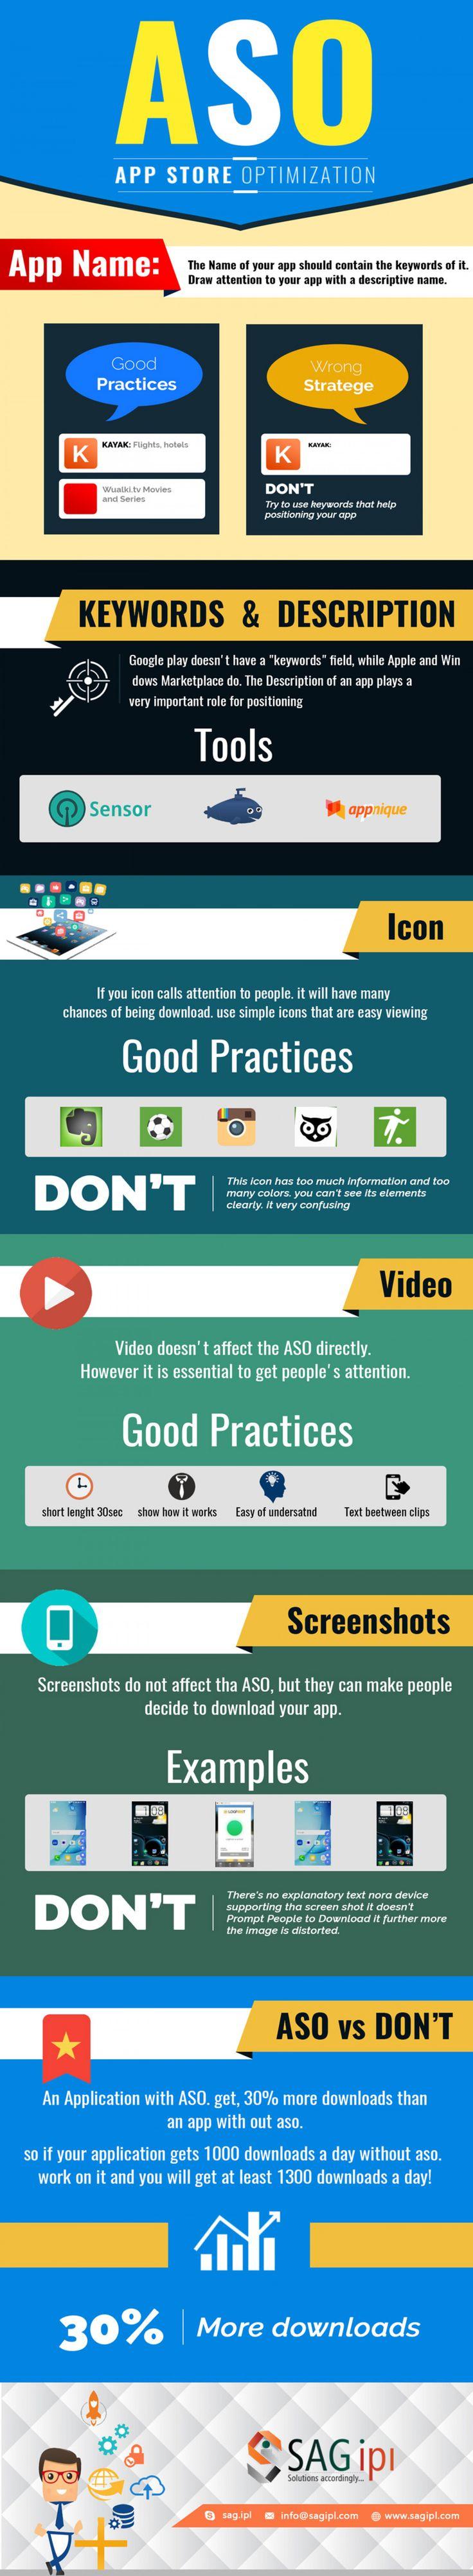 ASO, app store optimization, app store optimization tools, app store optimization services